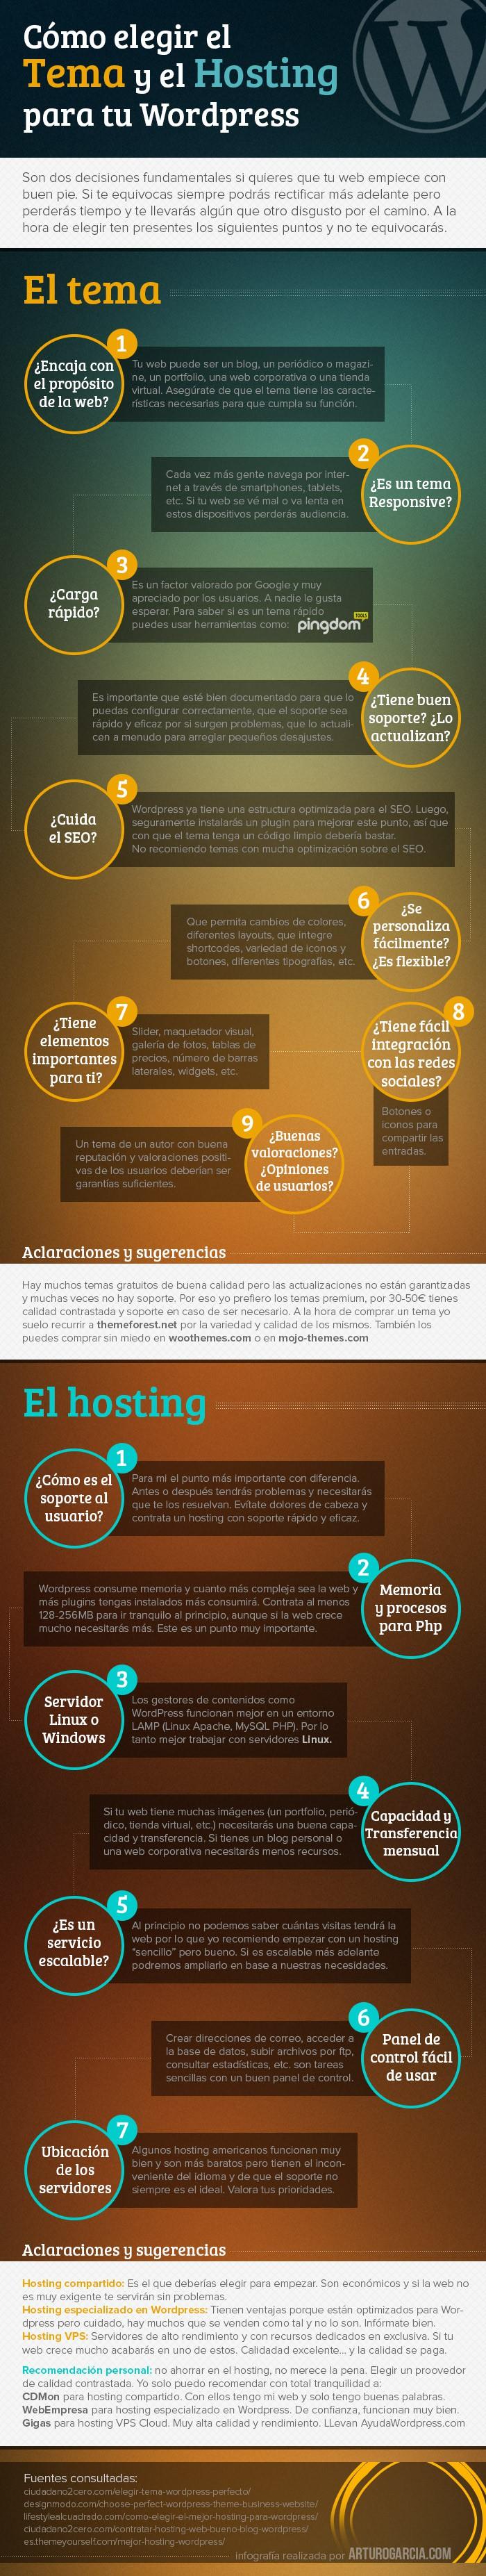 infografia elegir tema hosting wordpress Cómo elegir el tema y el hosting para tu WordPress (infografía)